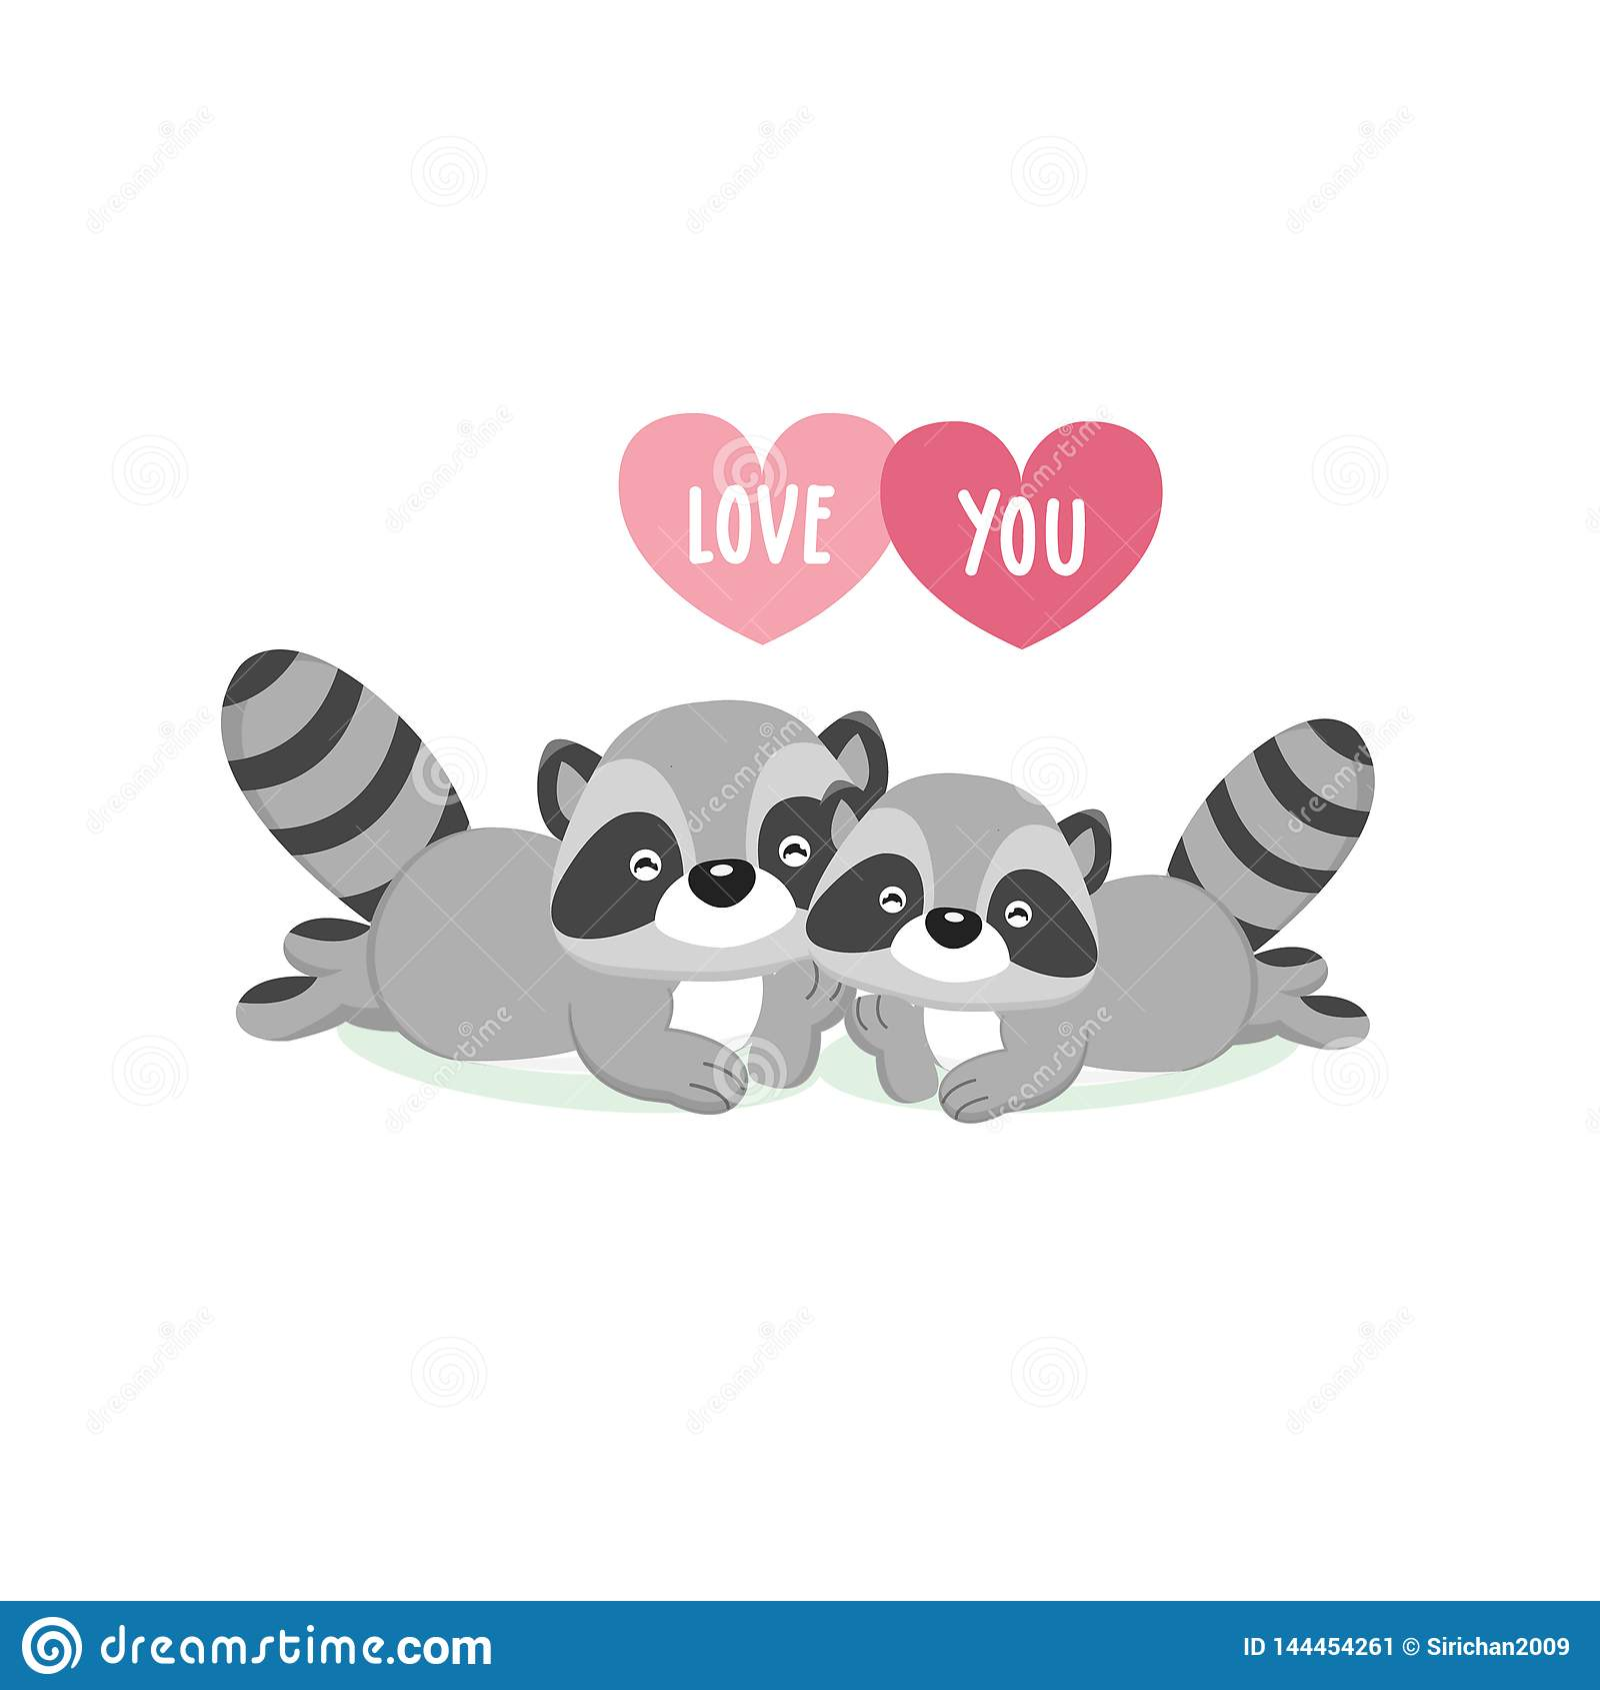 Tarjeta de felicitaci?n feliz del d?a de tarjeta del d?a de San Valent?n con los mapaches lindos de los pares en amor